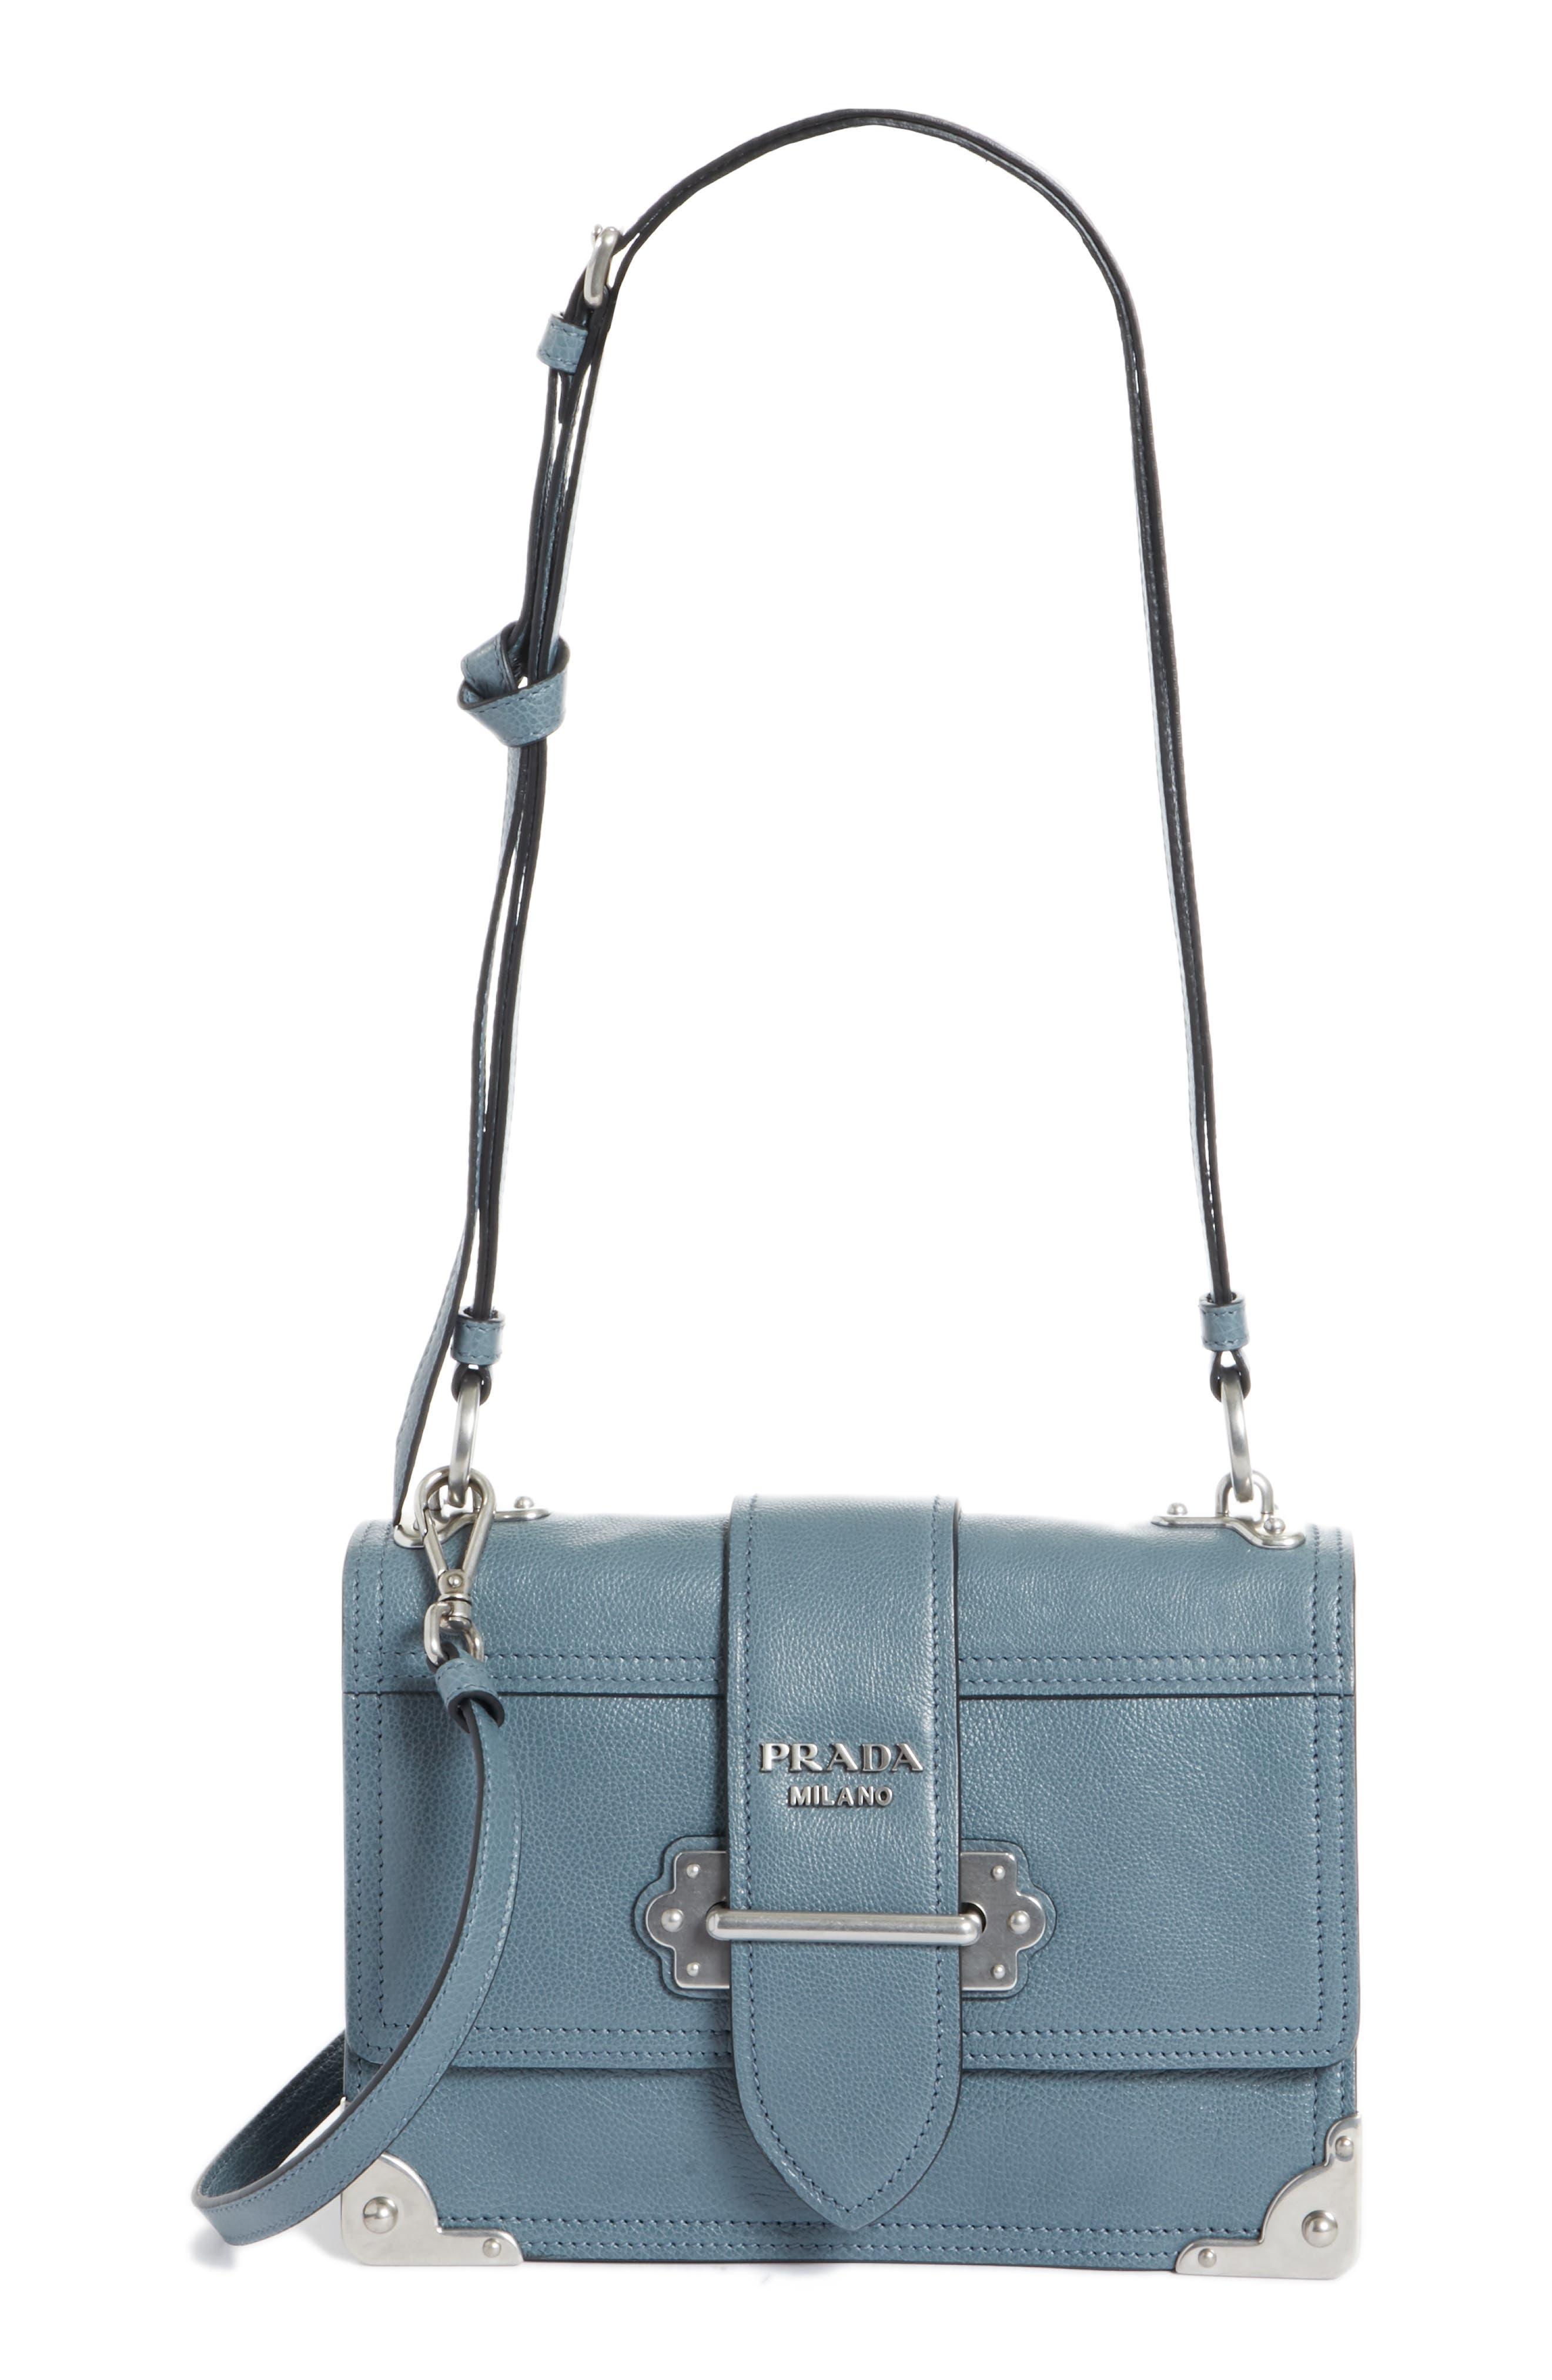 Prada Cahier Glace Calfskin Convertible Shoulder Bag